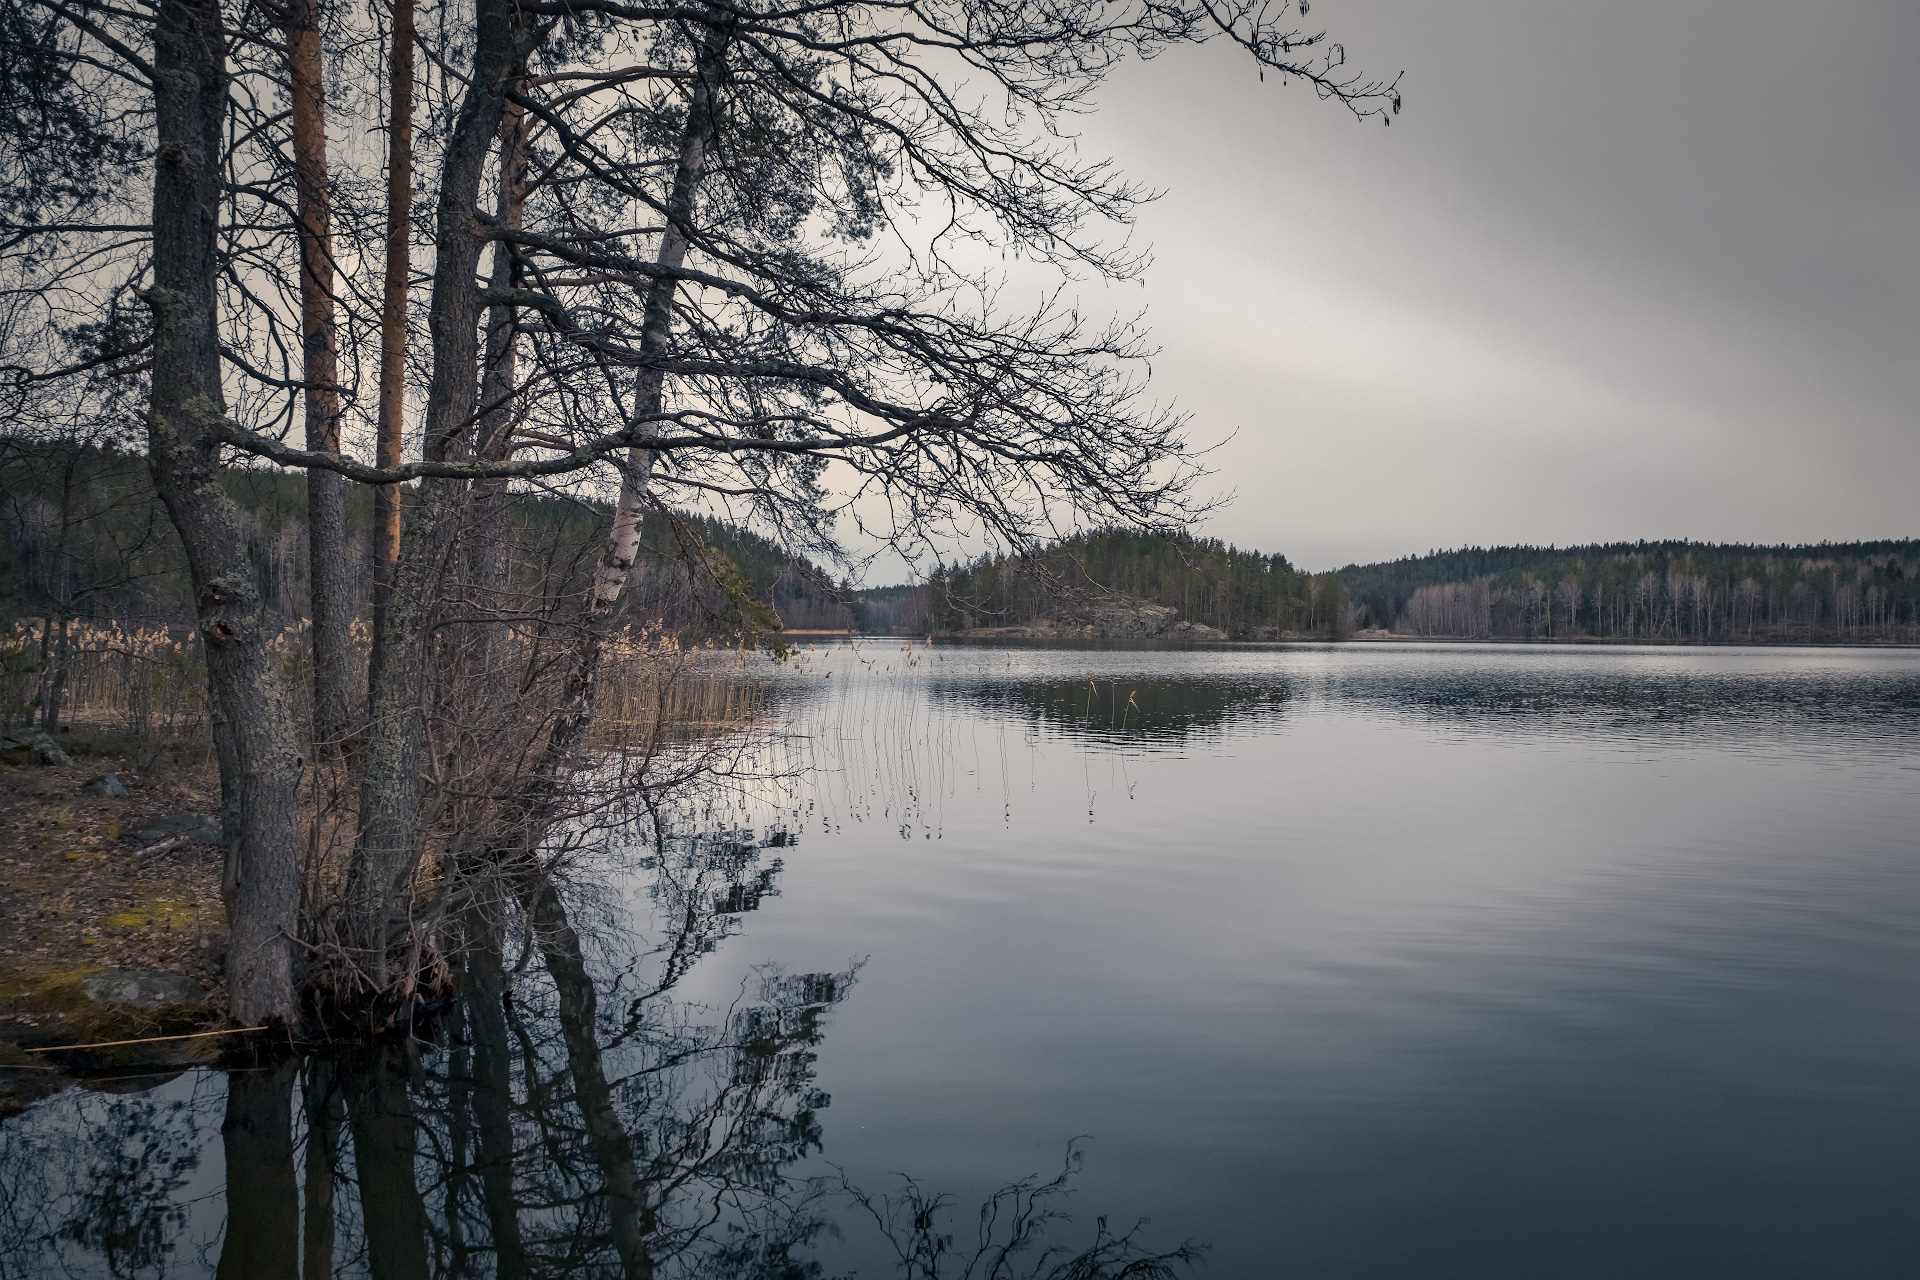 карелия, озеро, остров, кортеланъярви, скала, сосна, лес, облака, пейзаж, природа, Чиж Андрей